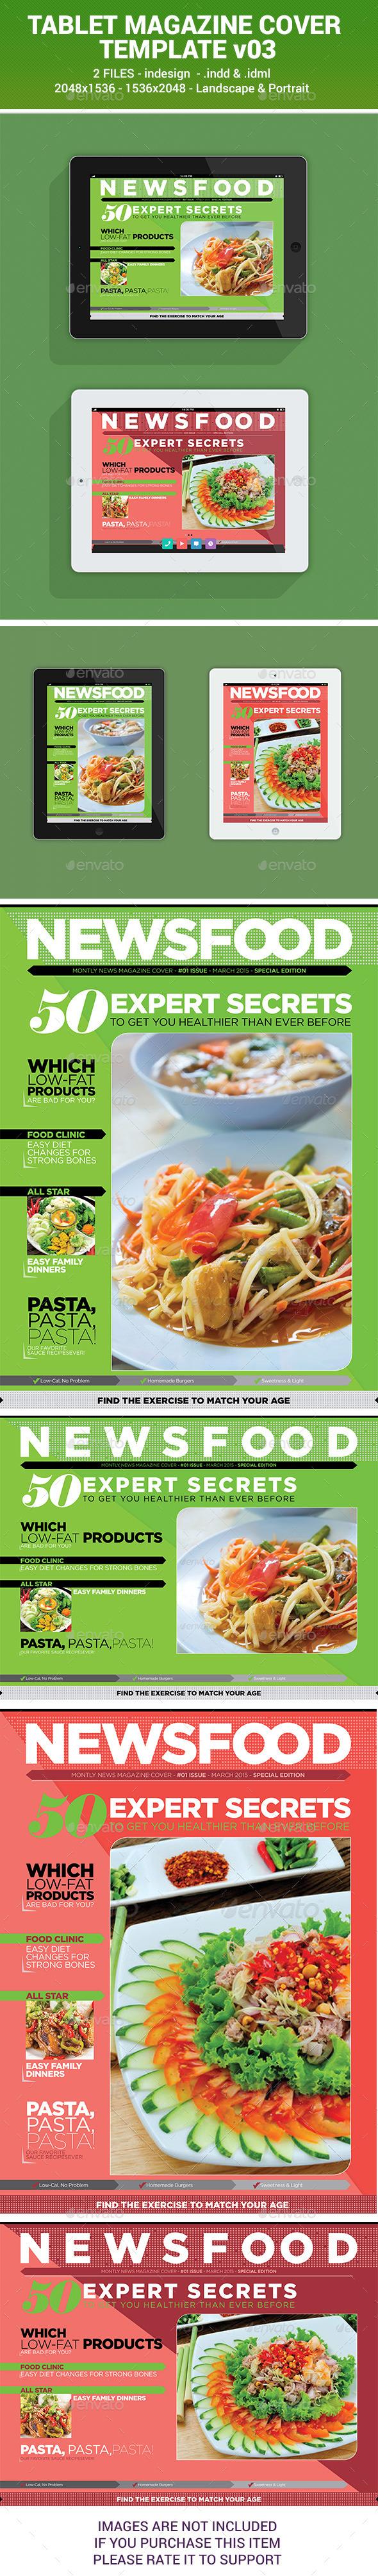 TABLET-MAGAZINE-COVER-PORTRAIT-LANDSCAPE-FOOD-v03 - Digital Magazines ePublishing